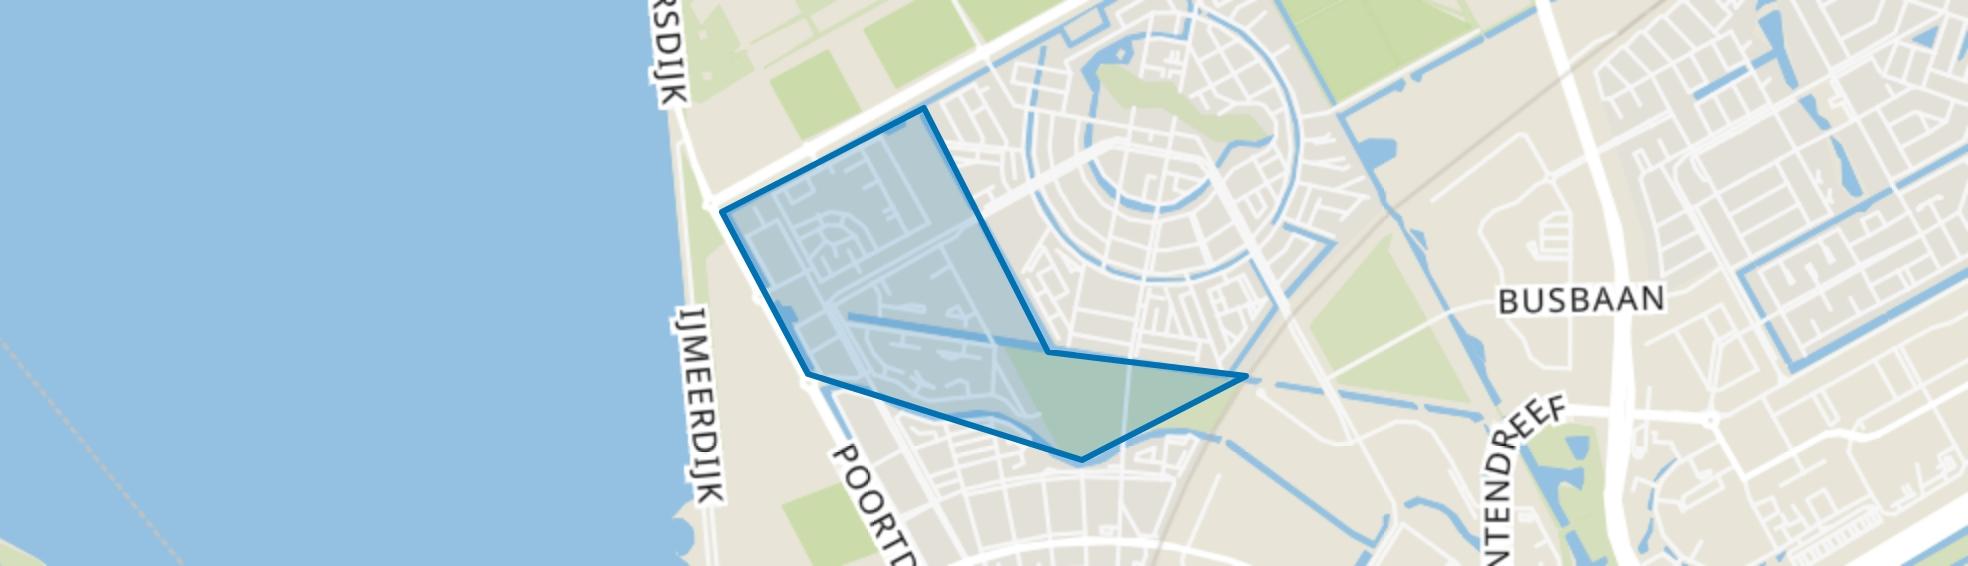 Columbuskwartier, Almere map